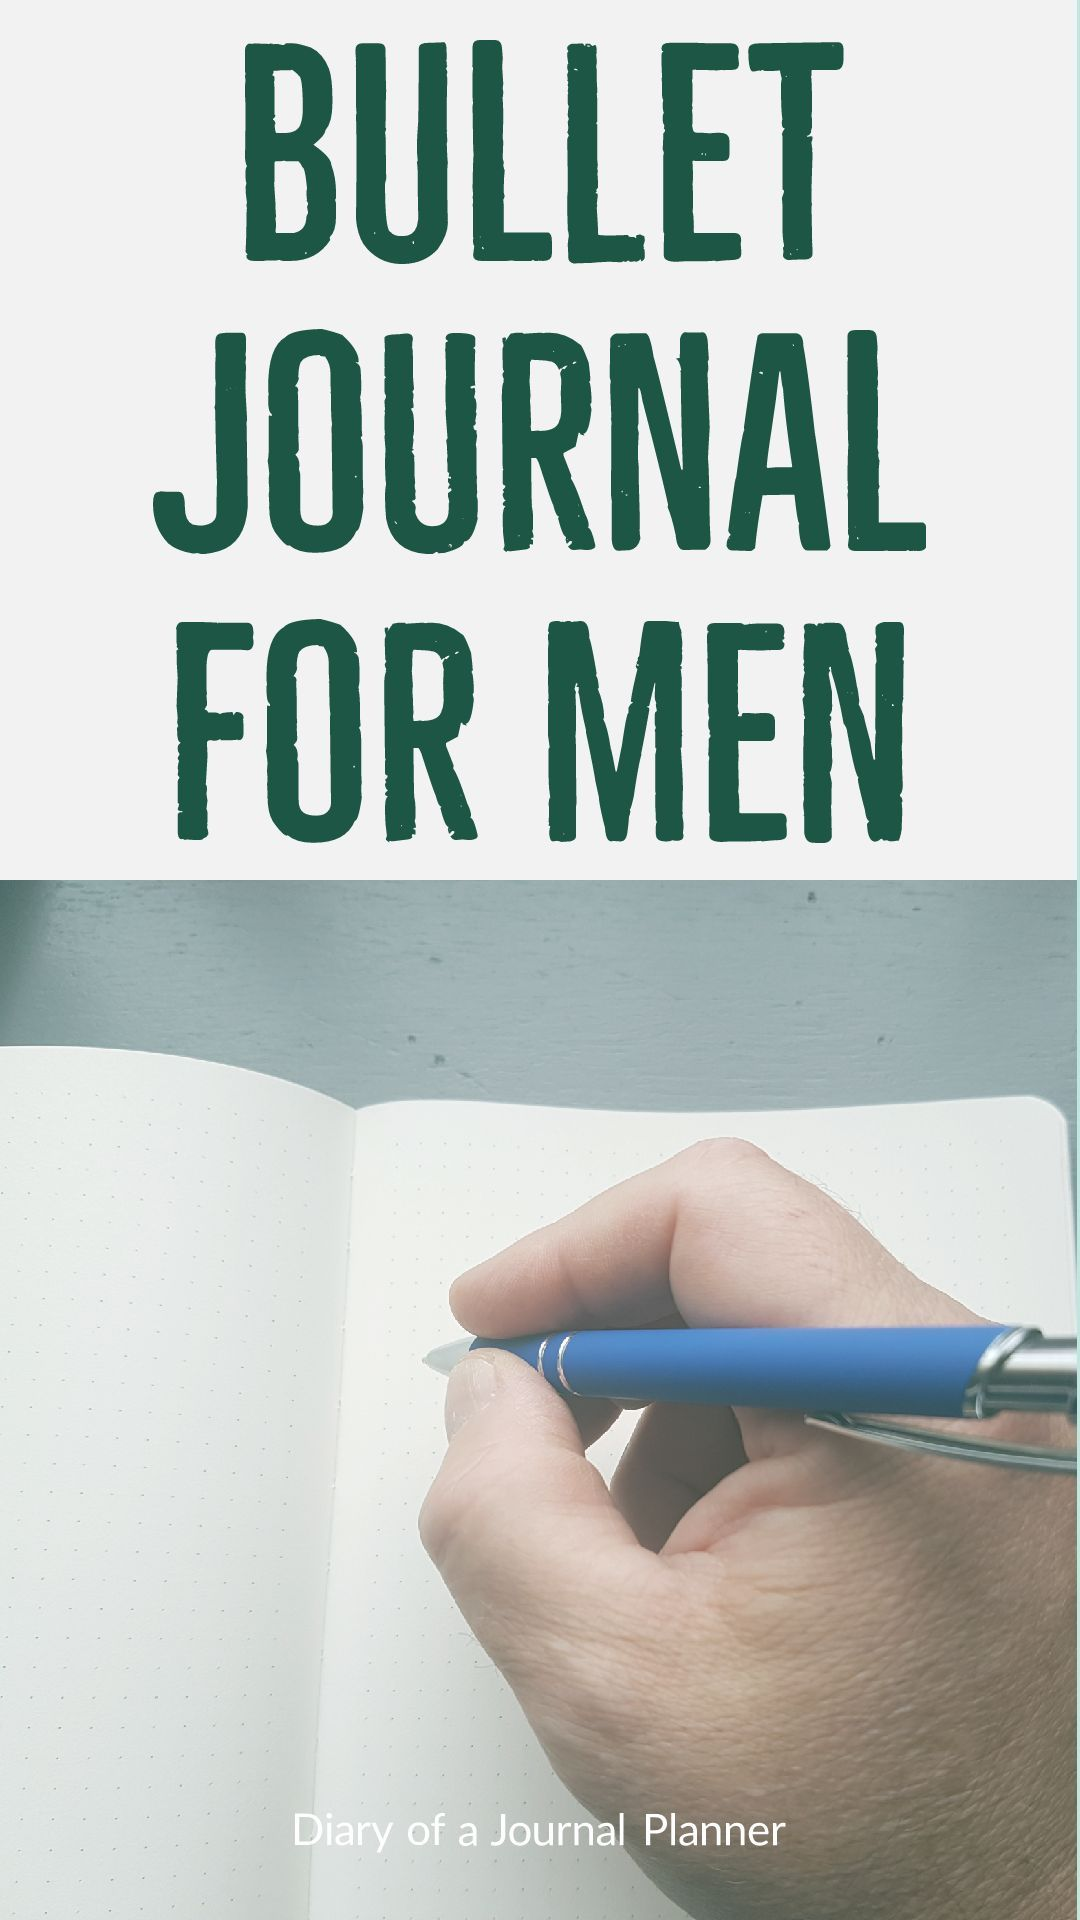 Bullet journal for men - The dude's guide to bullet journaling (2020)